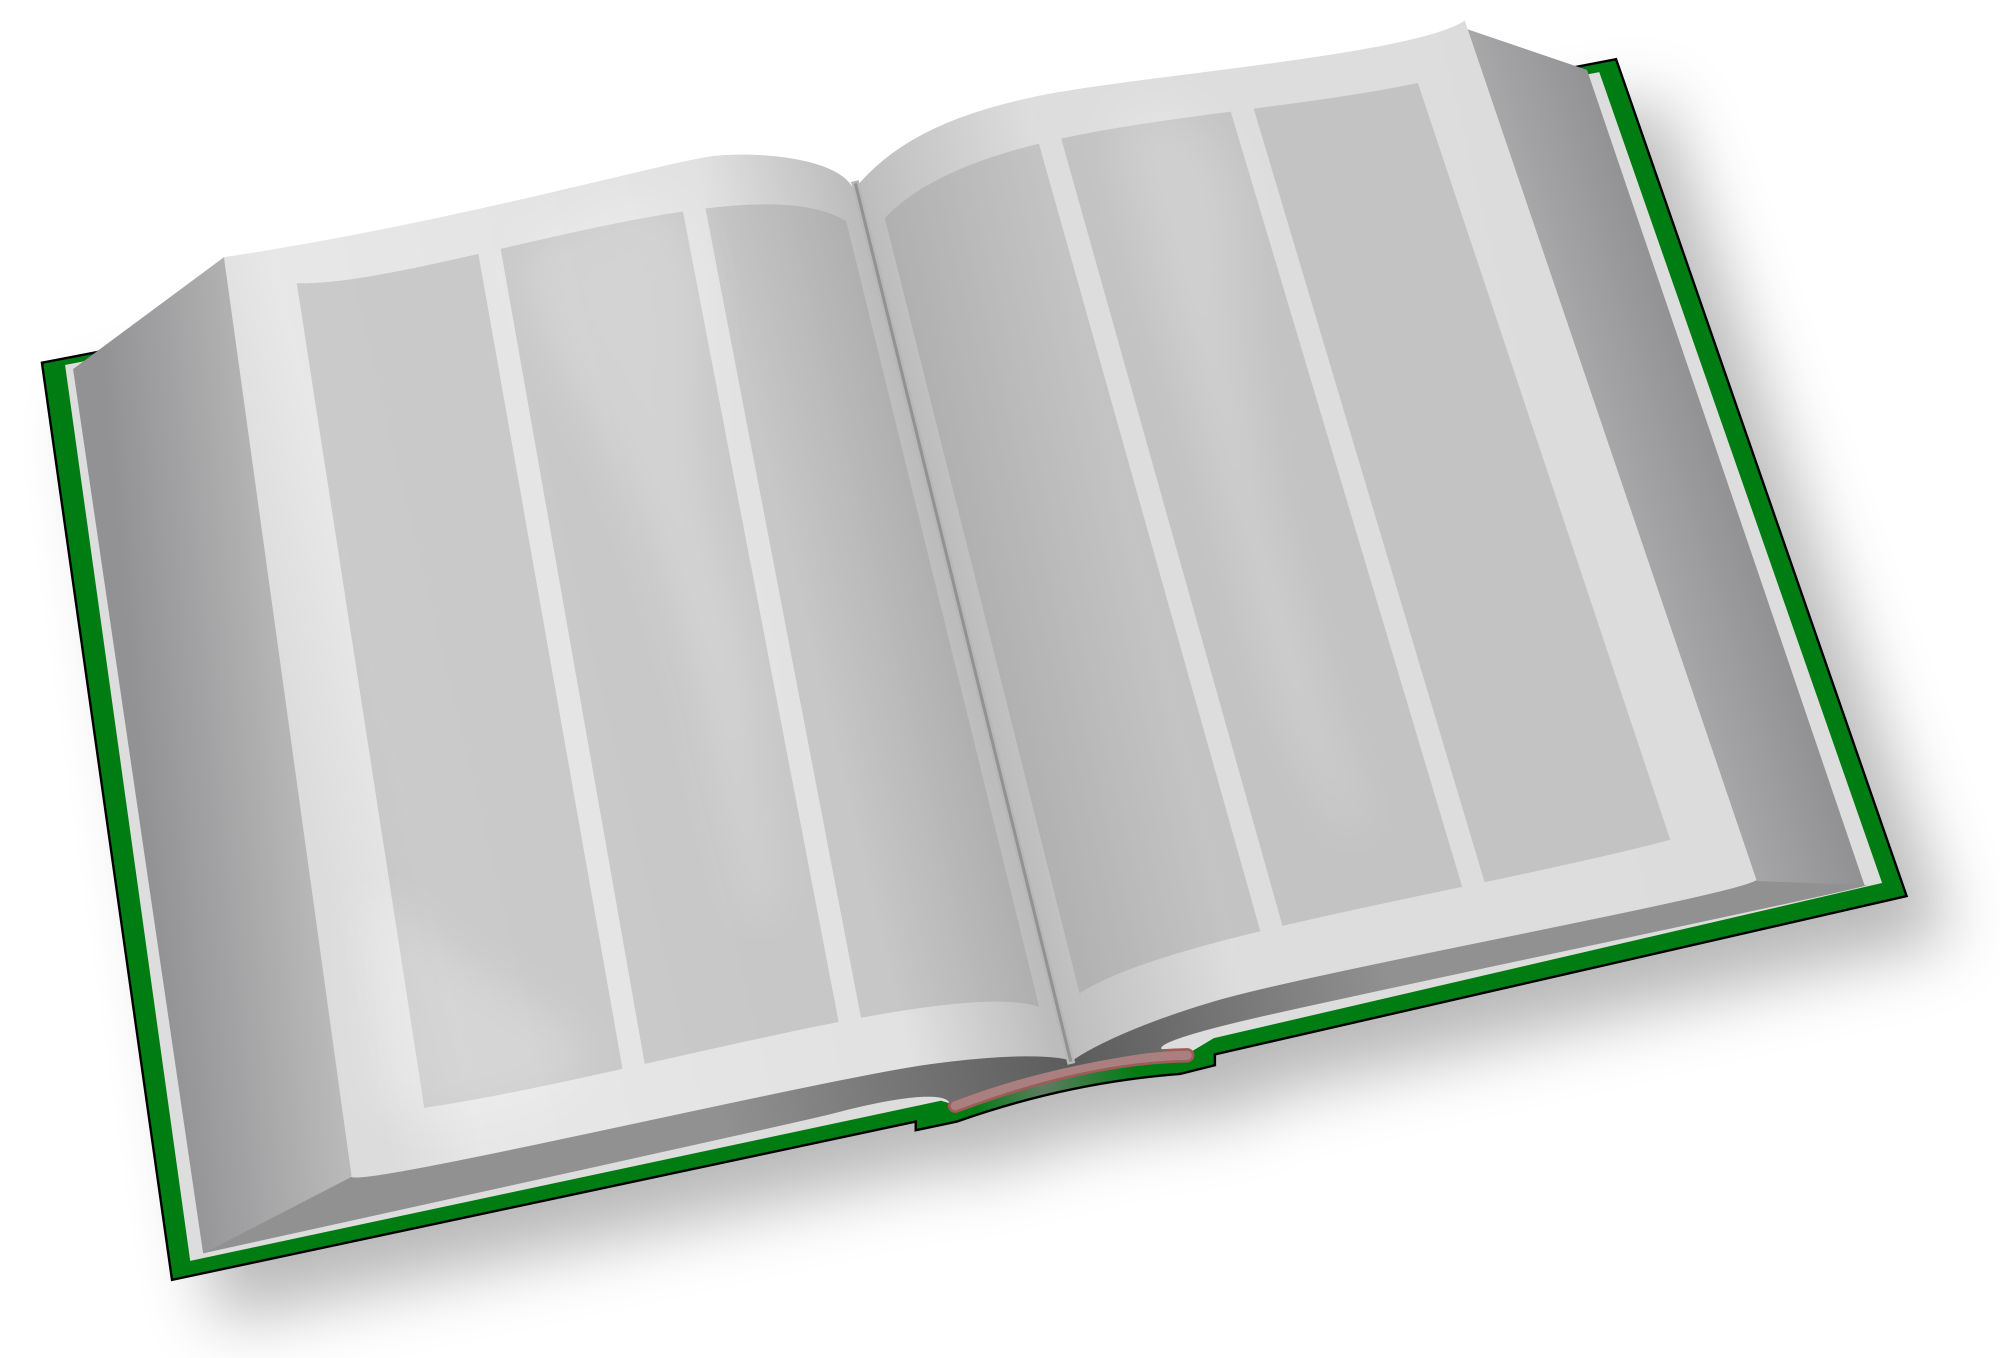 Big book center clipart banner transparent File:Big Book.svg - Wikimedia Commons banner transparent